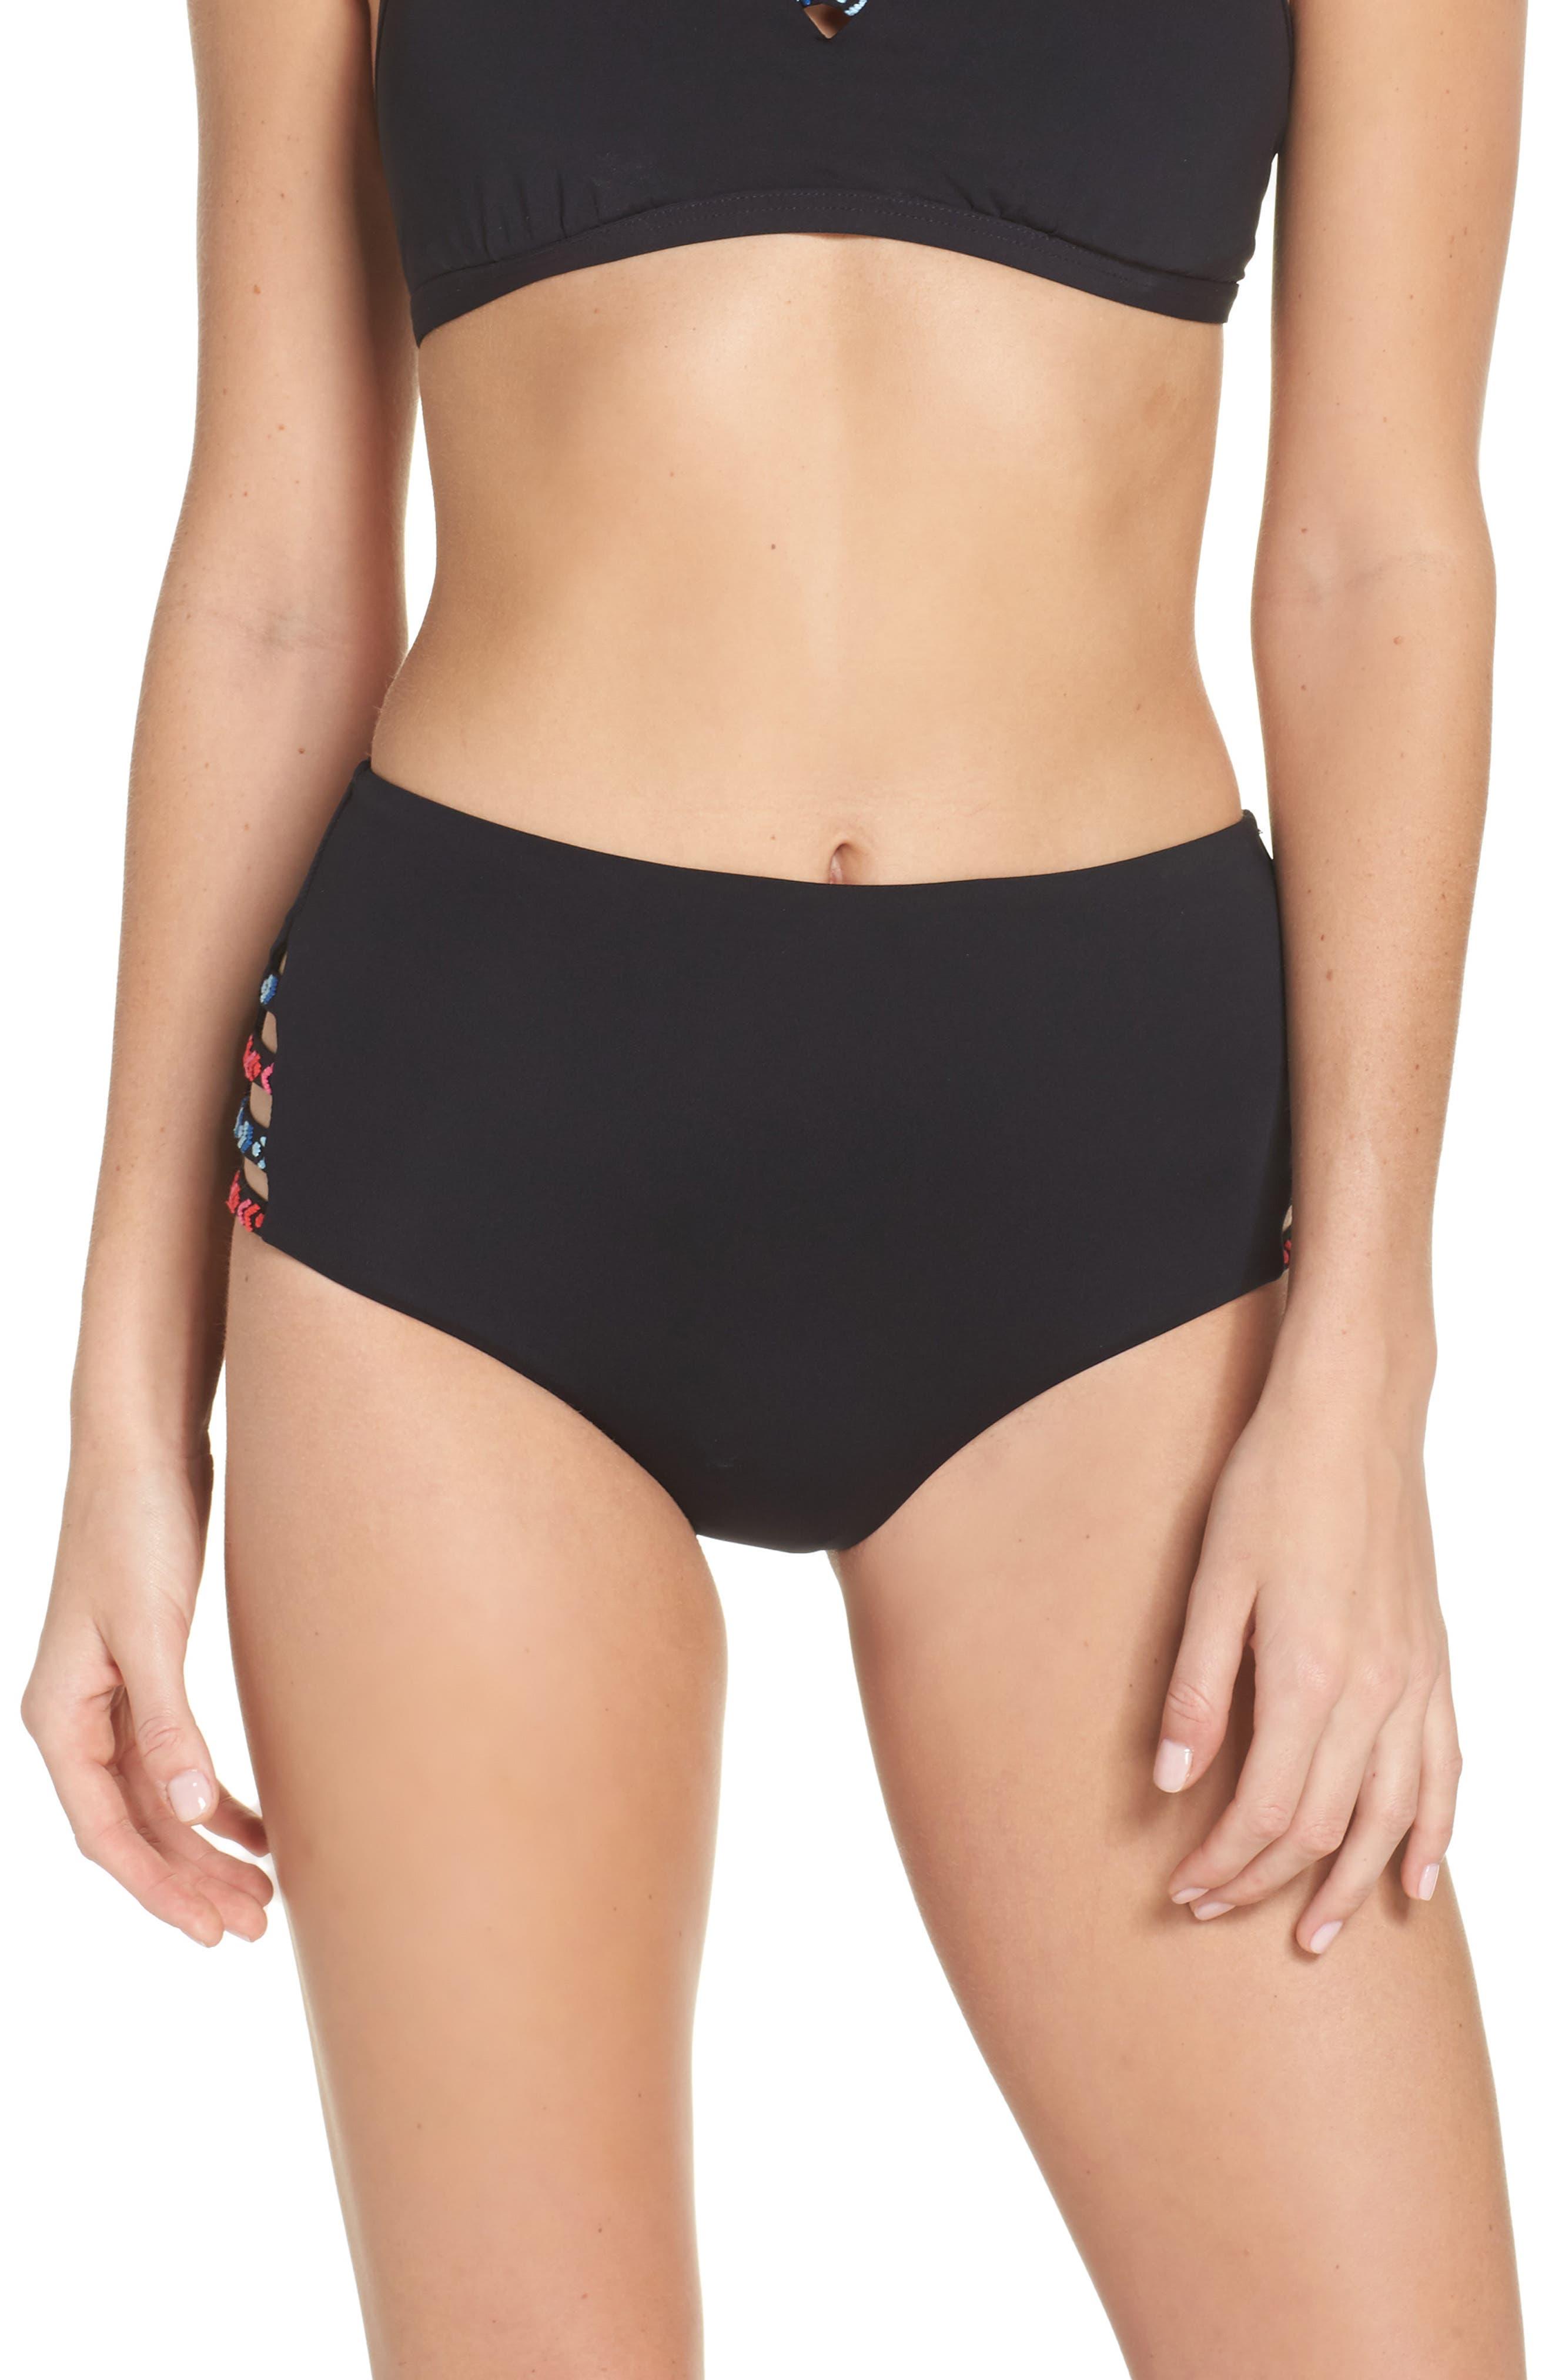 Desert Tribe High Waist Bikini Bottoms,                             Main thumbnail 1, color,                             Black